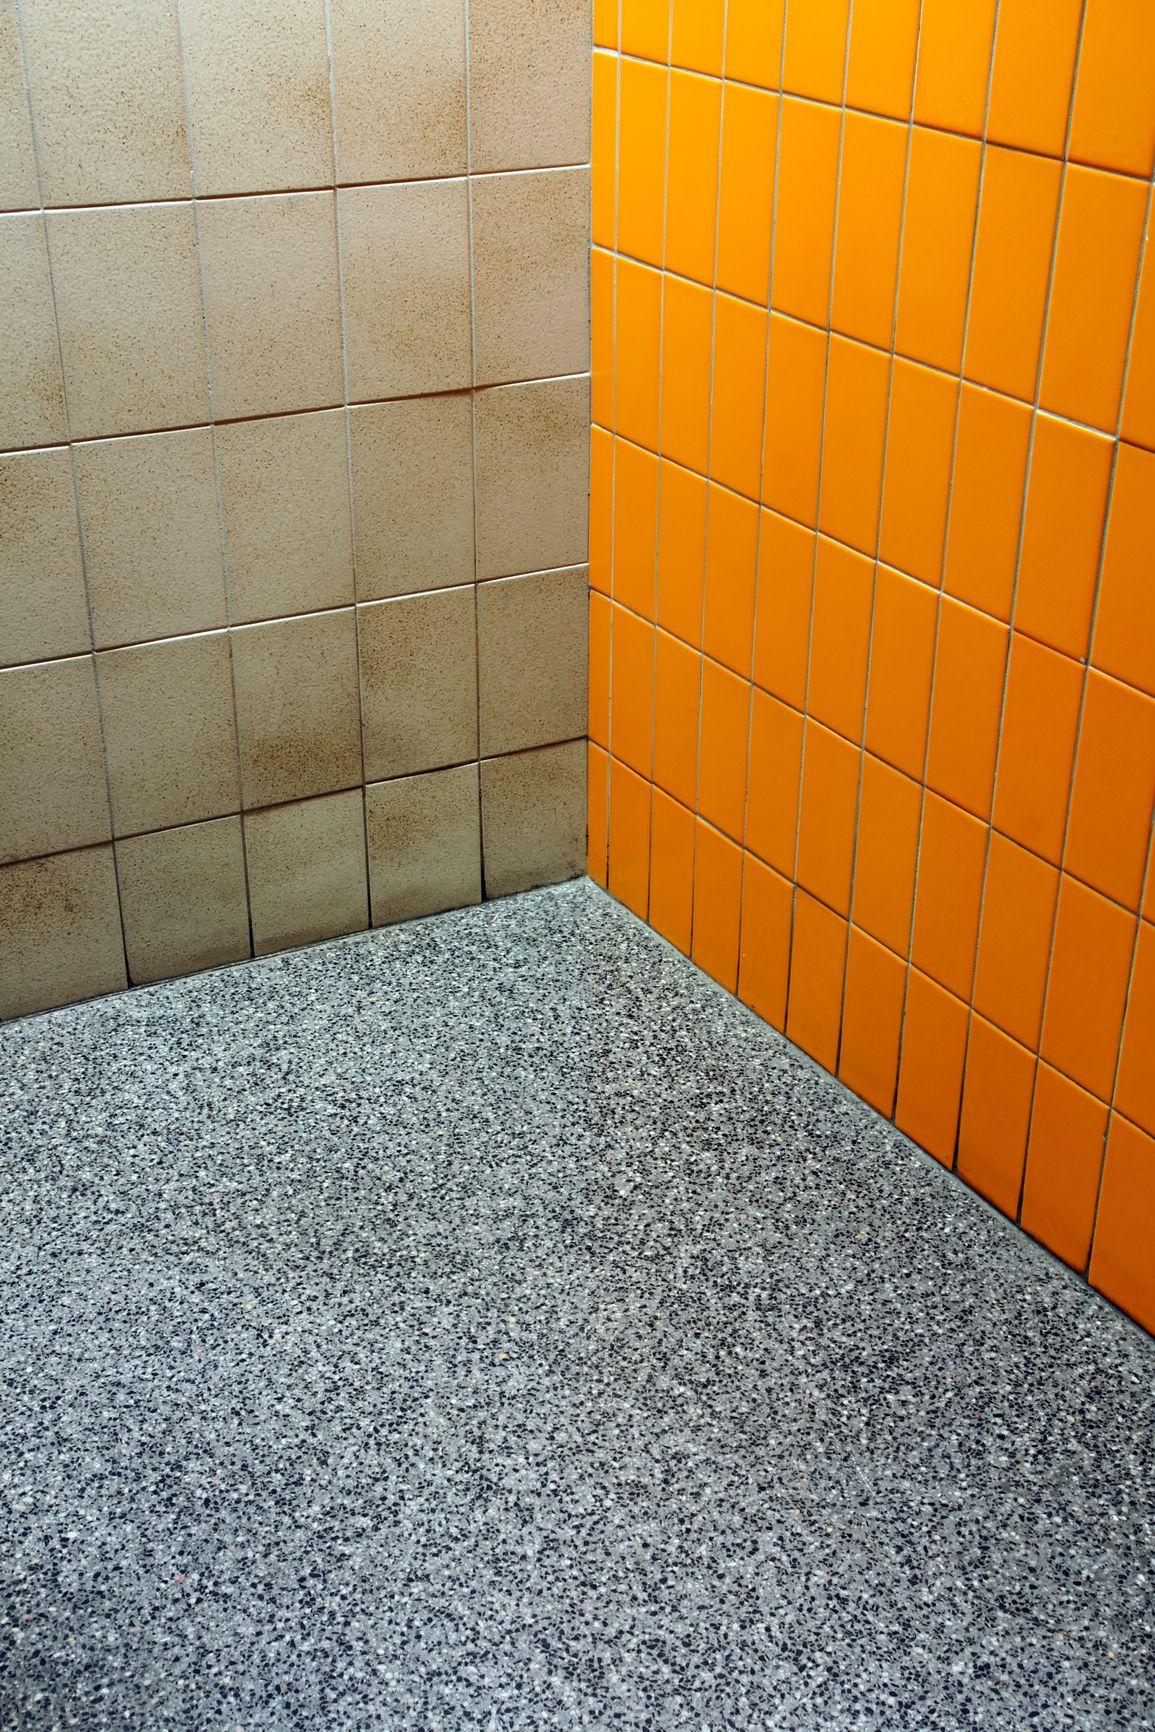 Corner of a public bathroom where three different